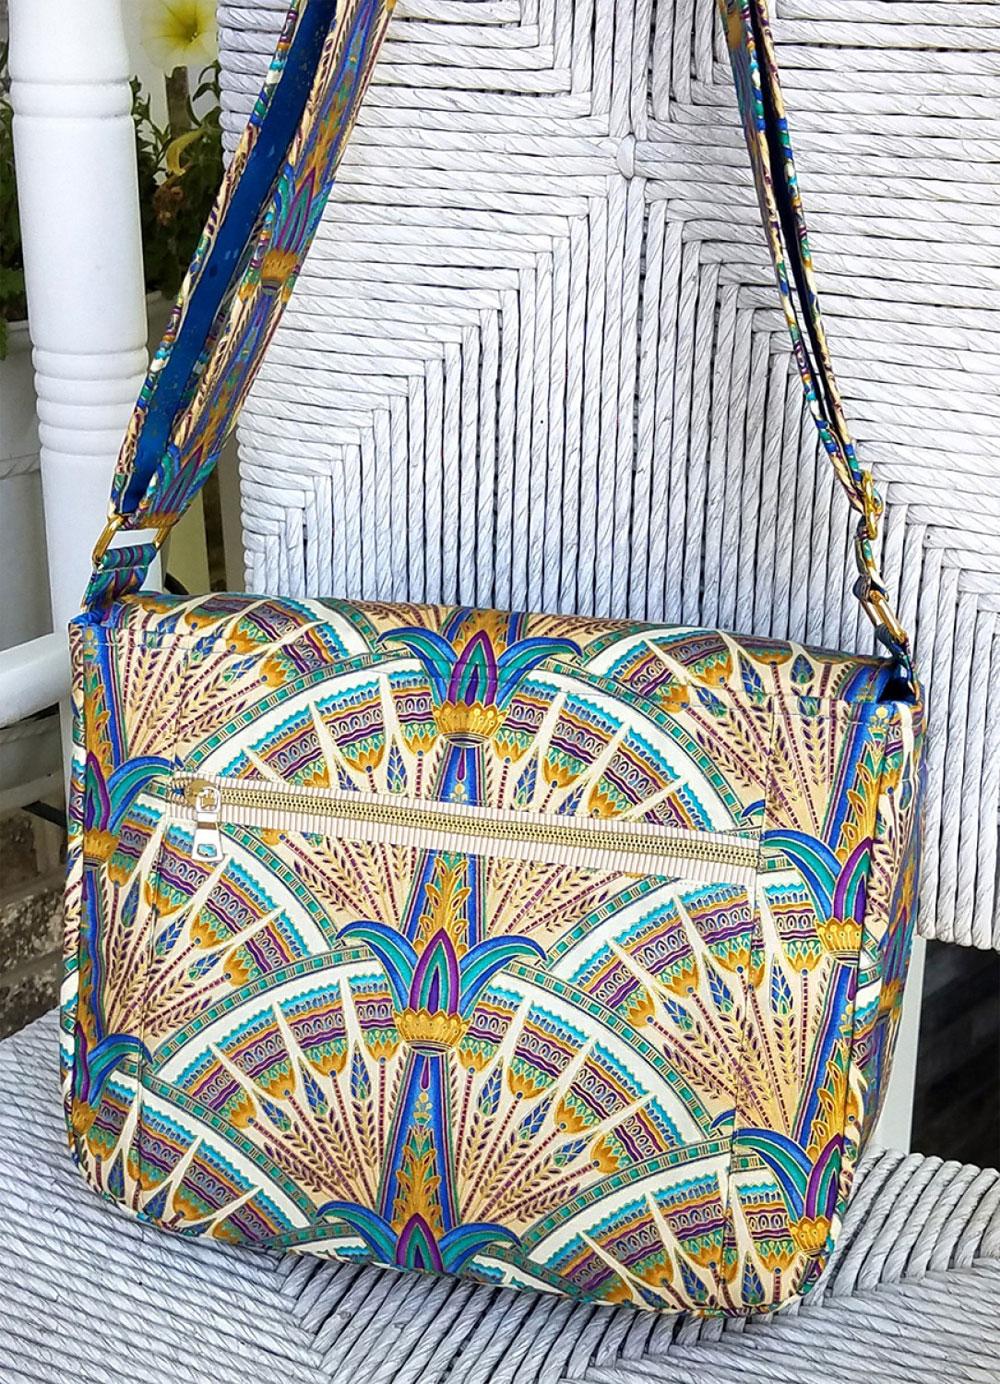 The-Flaptastic-Bag-sewing-pattern-Studio-Kat-Designs-2